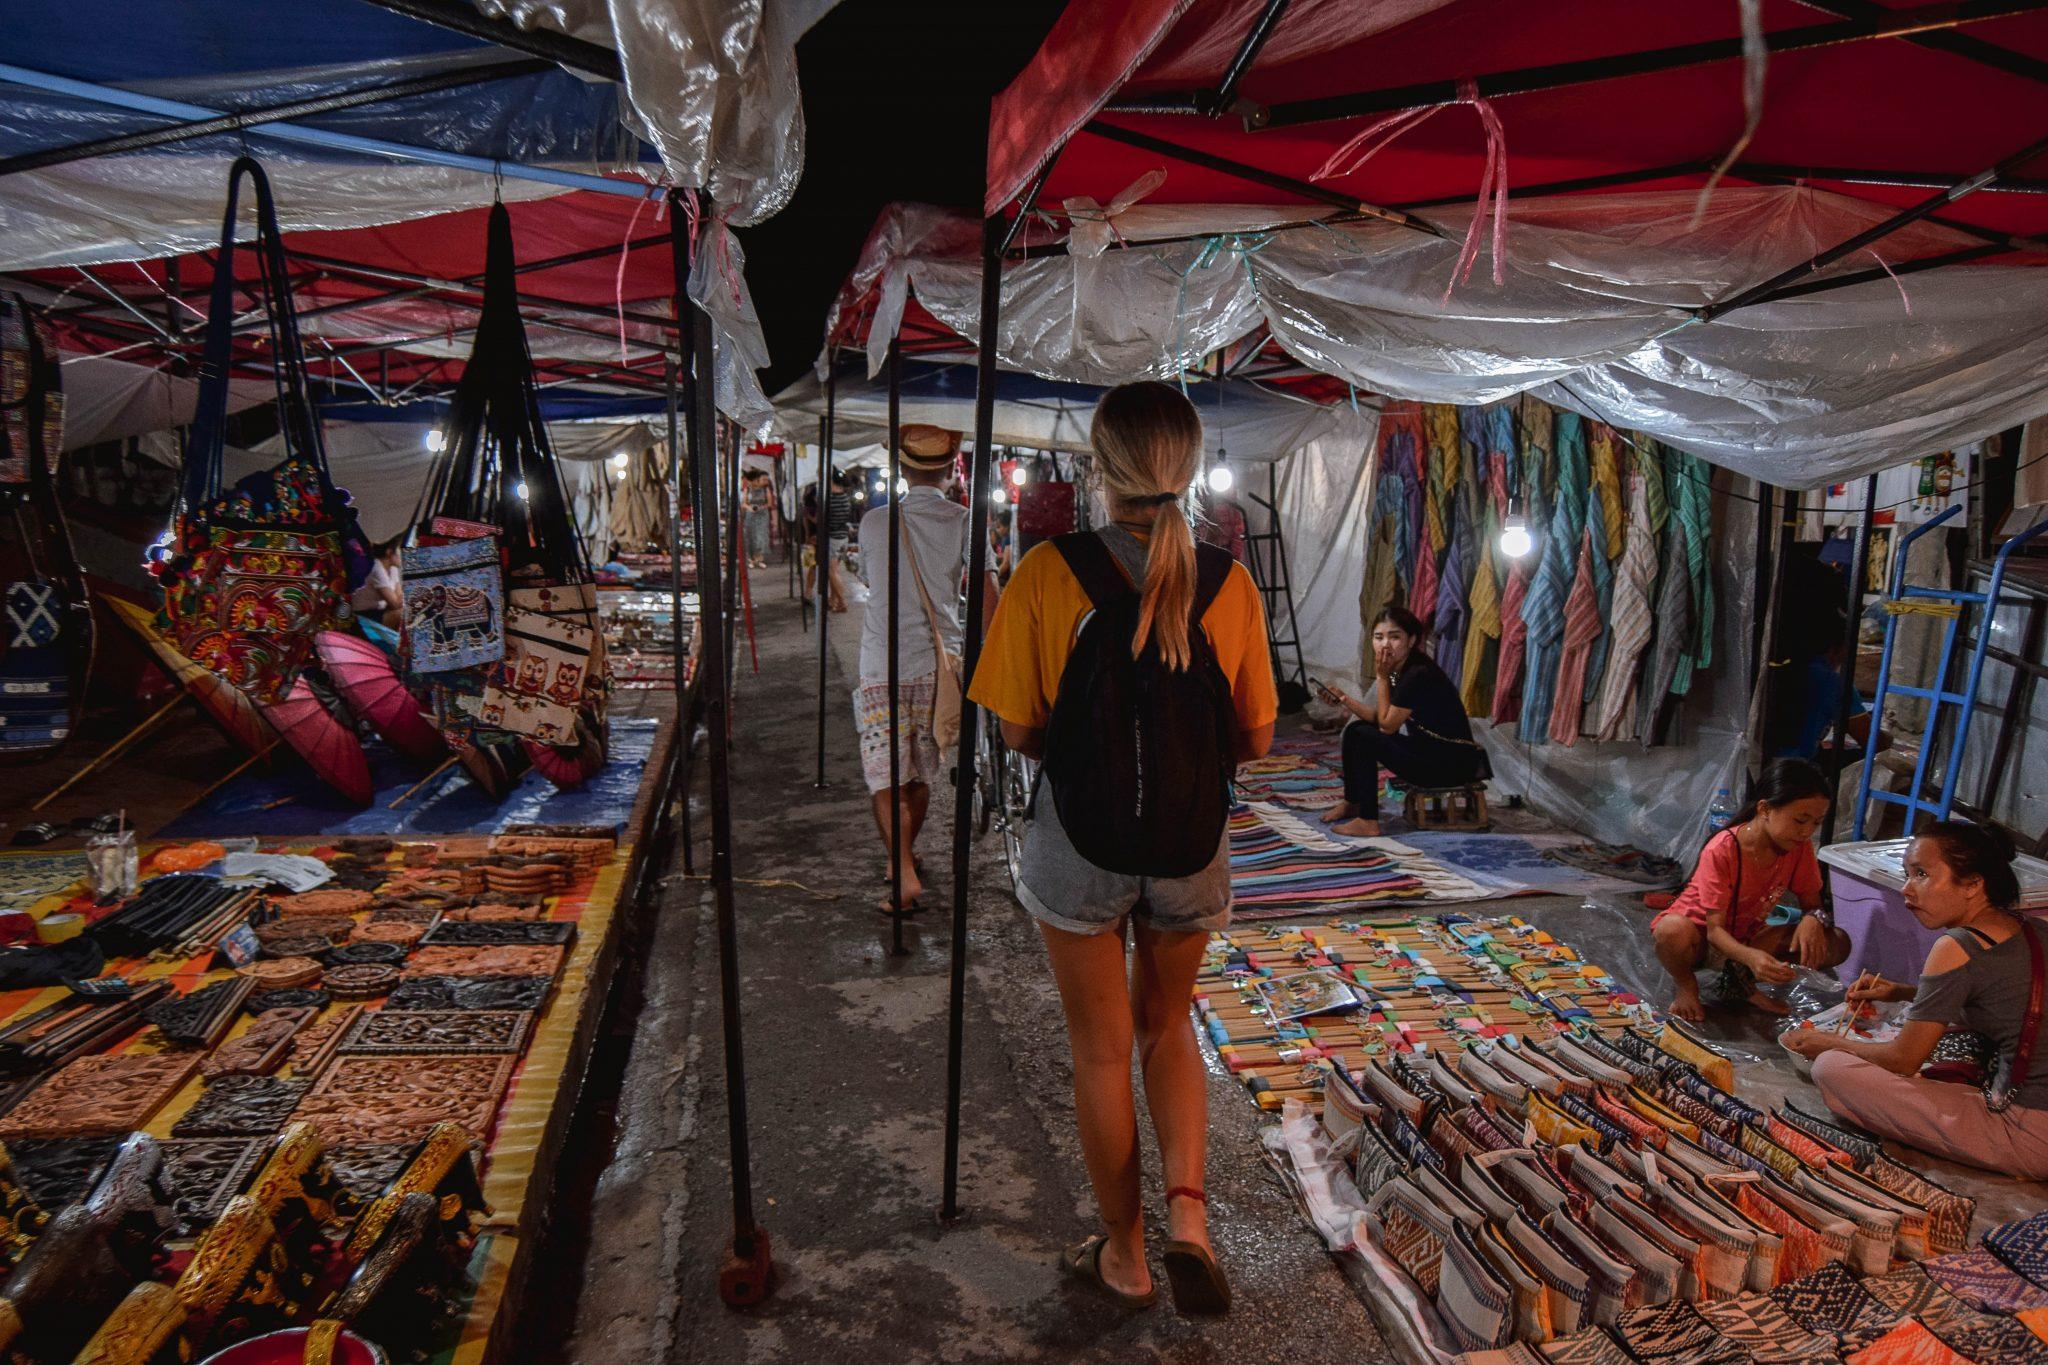 Wanderers & Warriors - Charlie & Lauren UK Travel Couple - Luang Prabang Night Market - The Best Market In Asia - Luang Prabang Attractions - Shopping In Luang Prabang Market - Laos Night Market